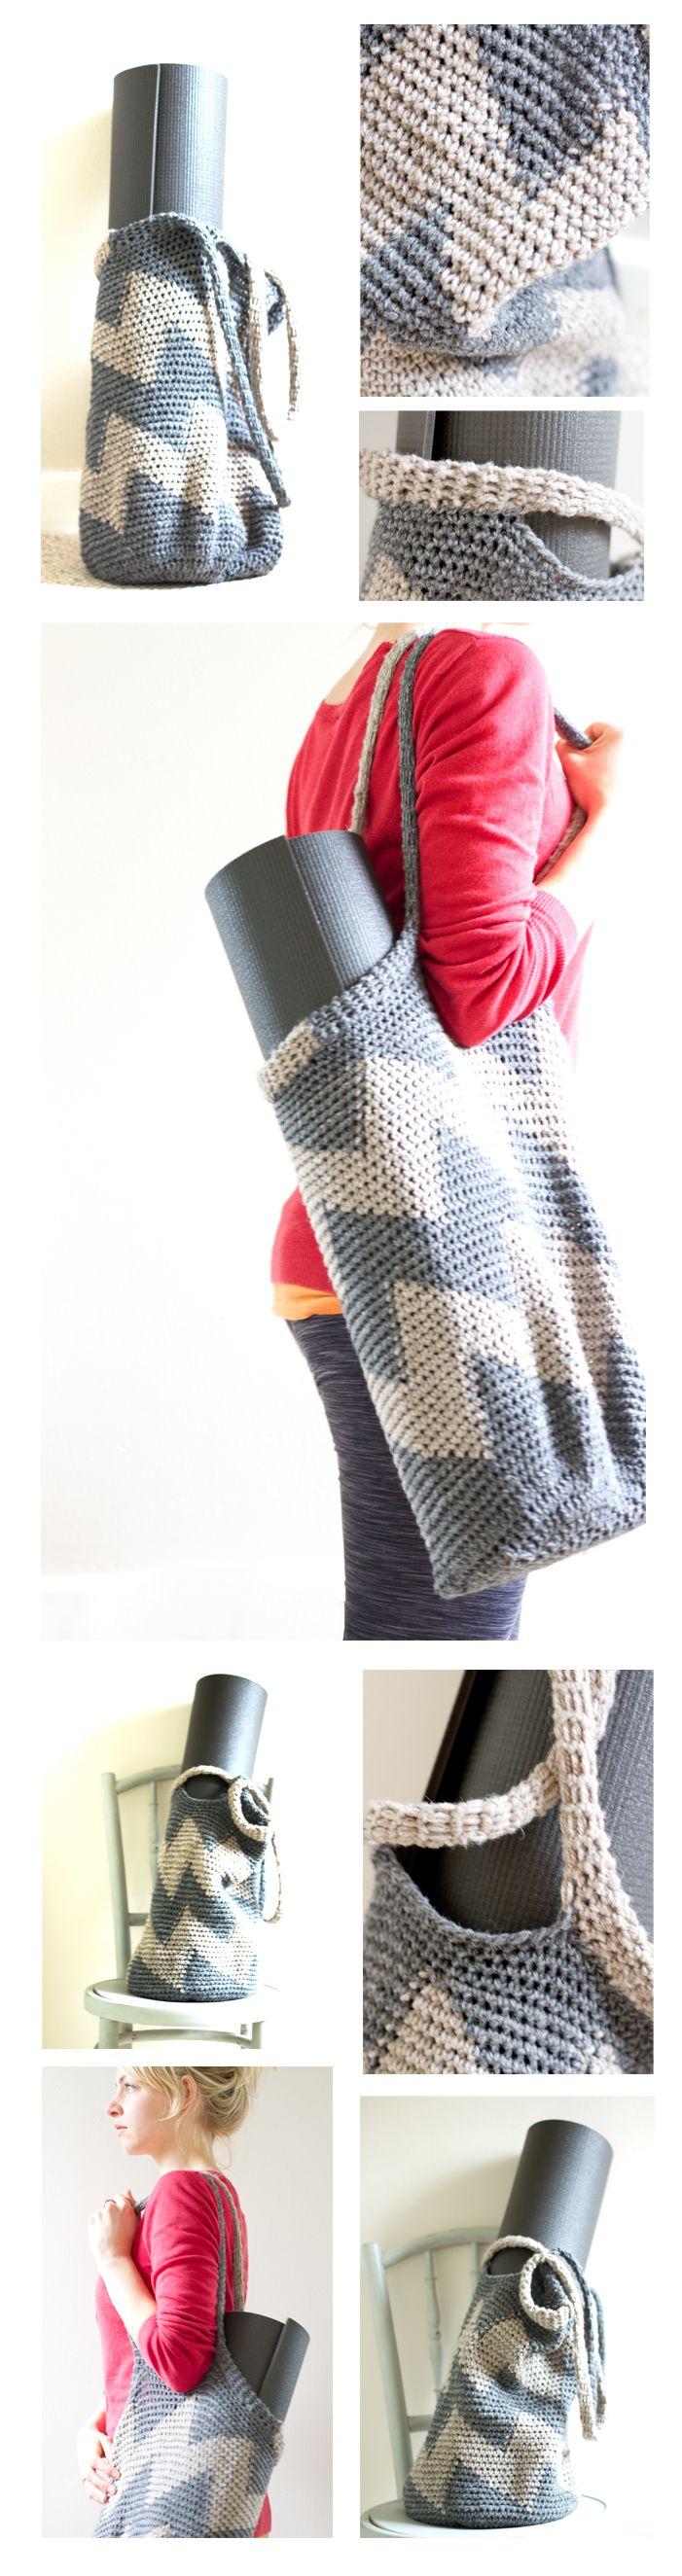 Crochet yoga bag pattern: Chevron Patterns, Bags Tutorials, Free Pattern, Bags Crochet, Chevron Bags, Crochet Bag Patterns, Bags Patterns, Yoga Bag, Crochet Patterns